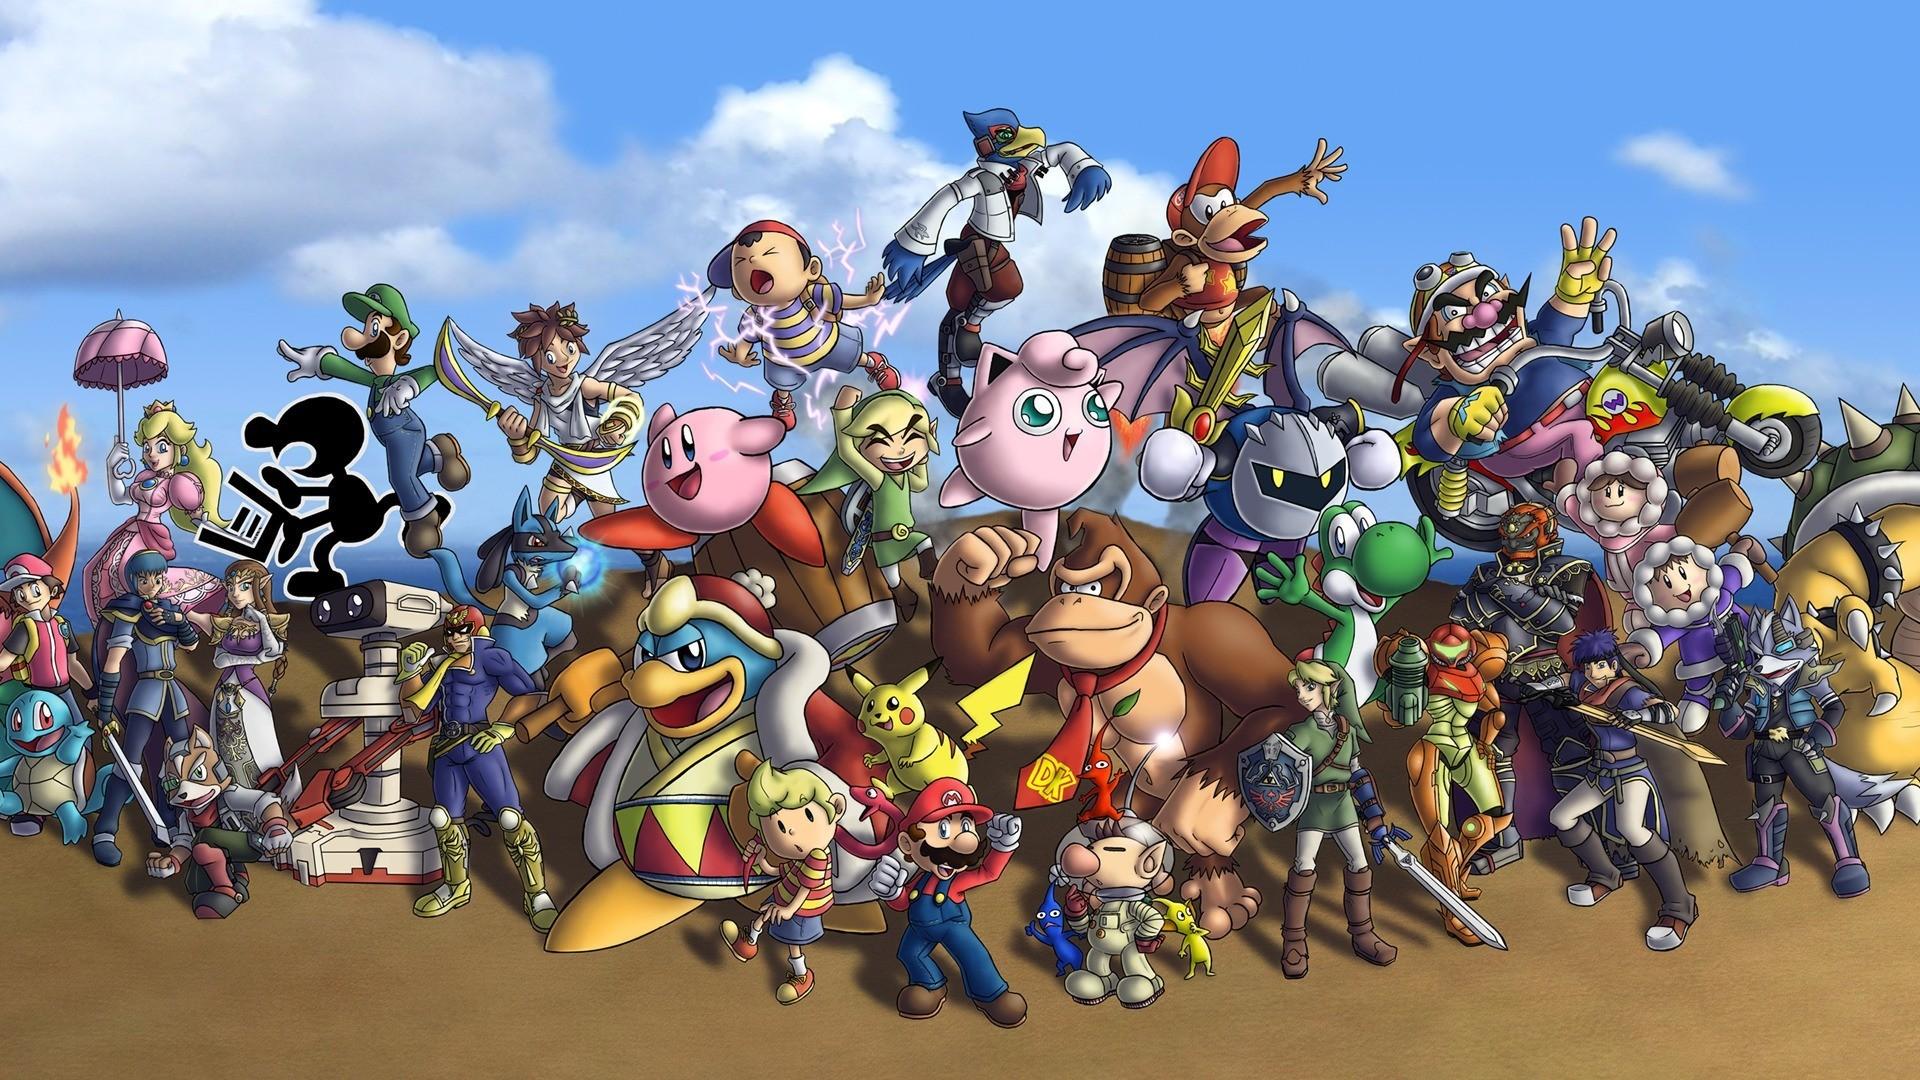 Top Smash Bros Iphone Wallpapers Wallpapers